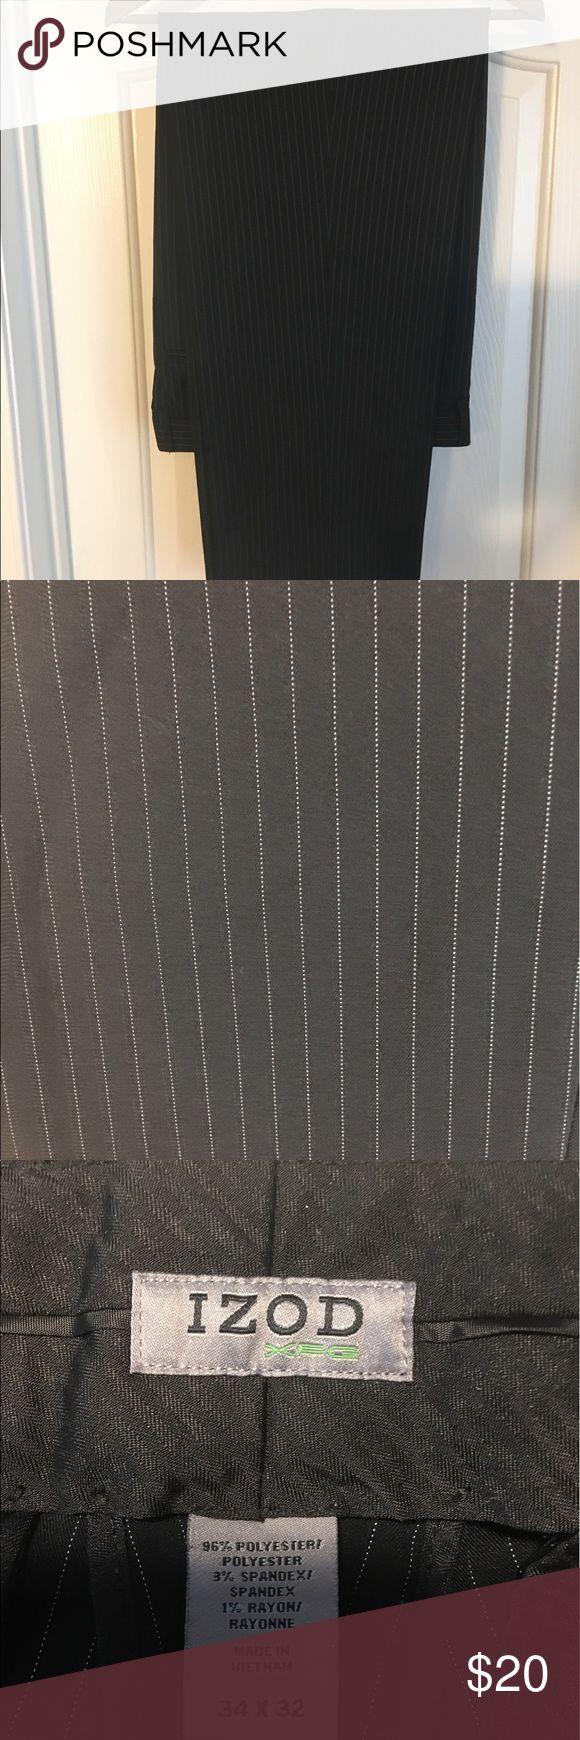 Black pinstripe Izod golf pants Black pinstripe golf pants from Izod. Worn only a few times. Good condition Izod Pants Dress